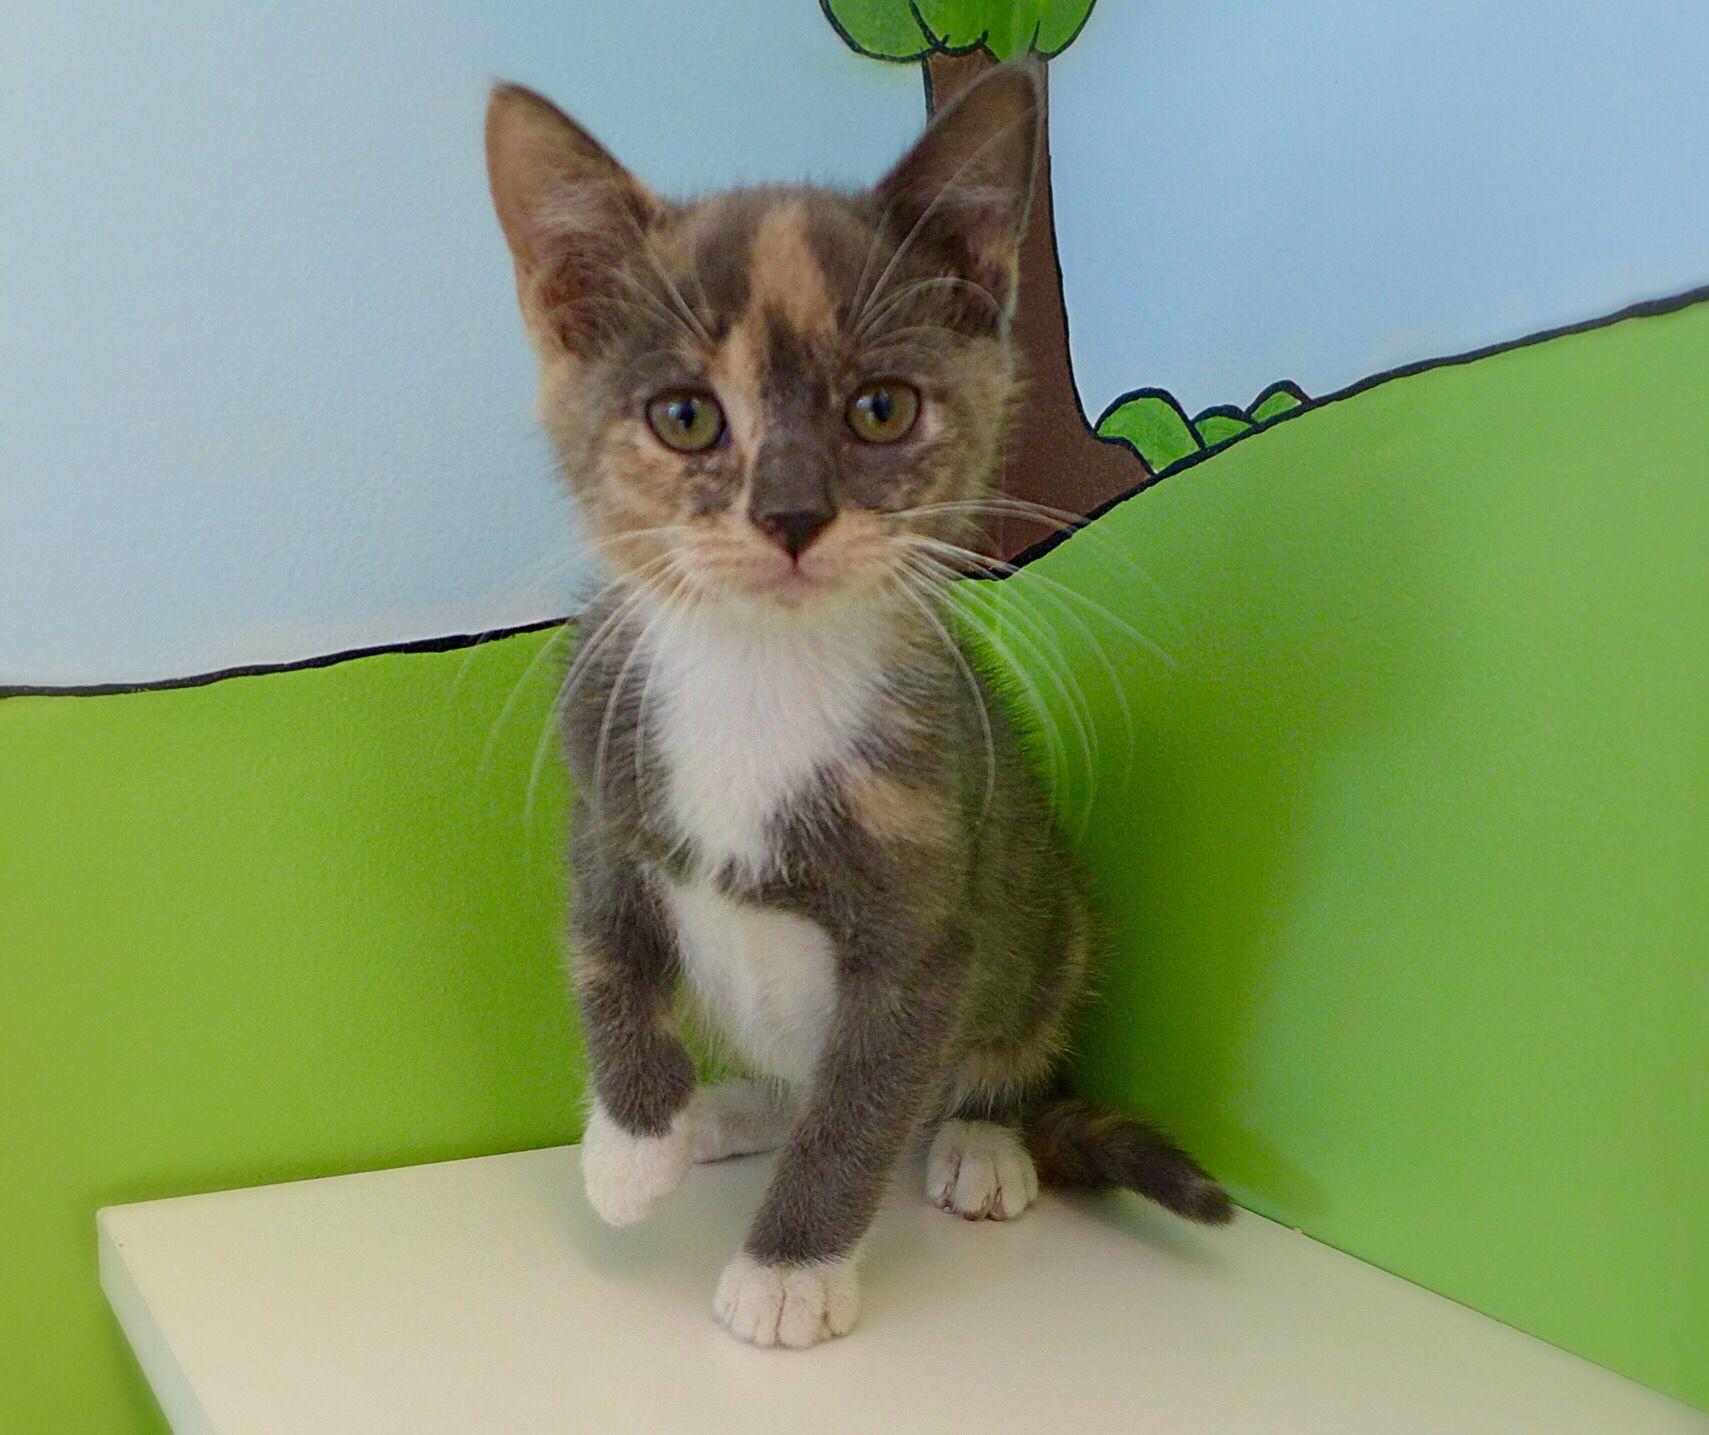 Adorable kittens ready for adoption! Kitten adoption